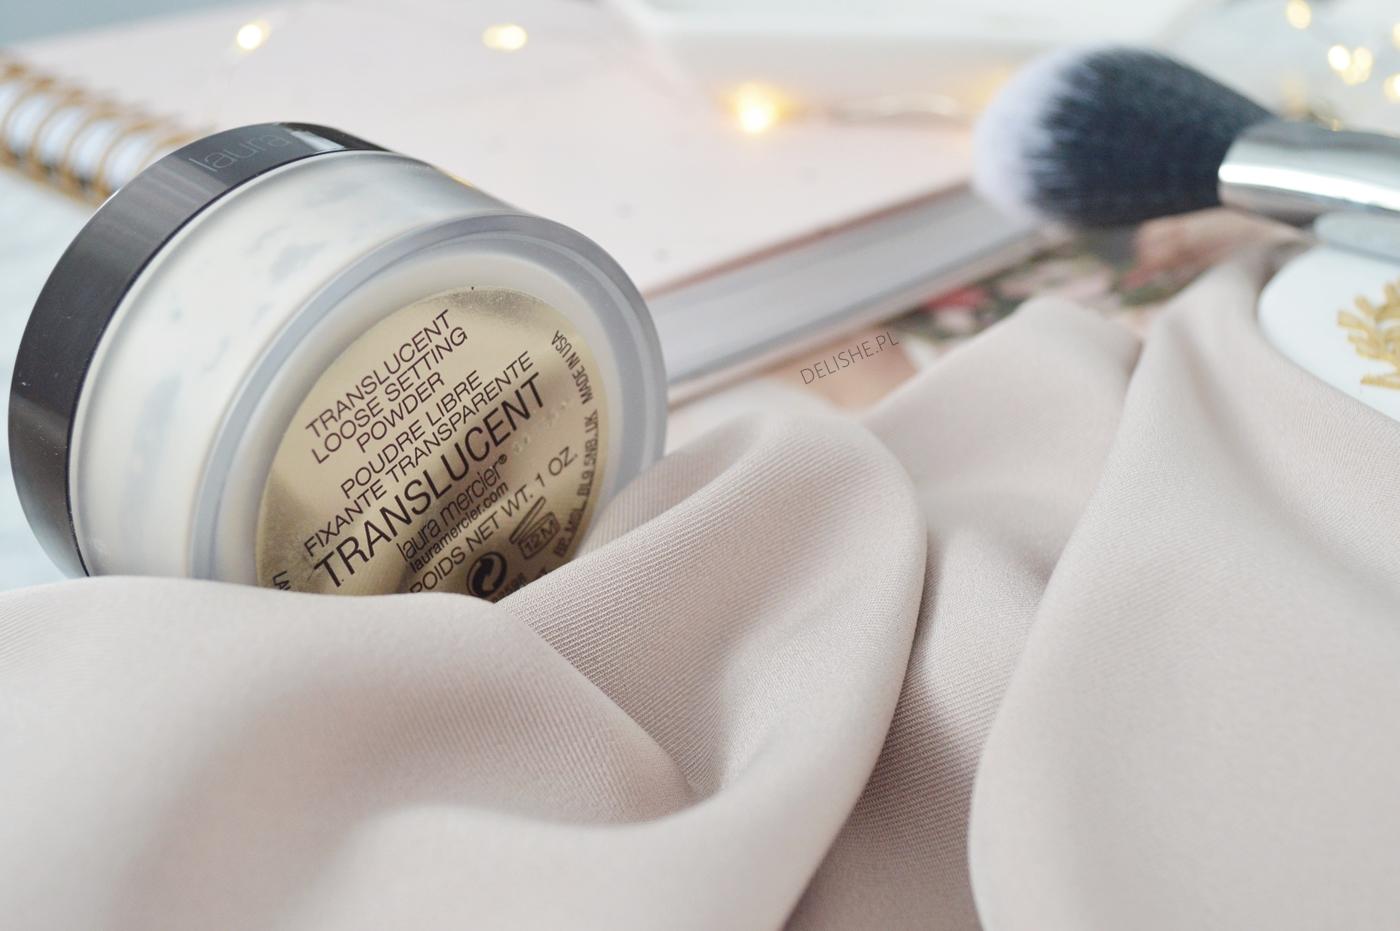 Czy warto kupić puder Laura Mercier Translucent Loose Setting Powder